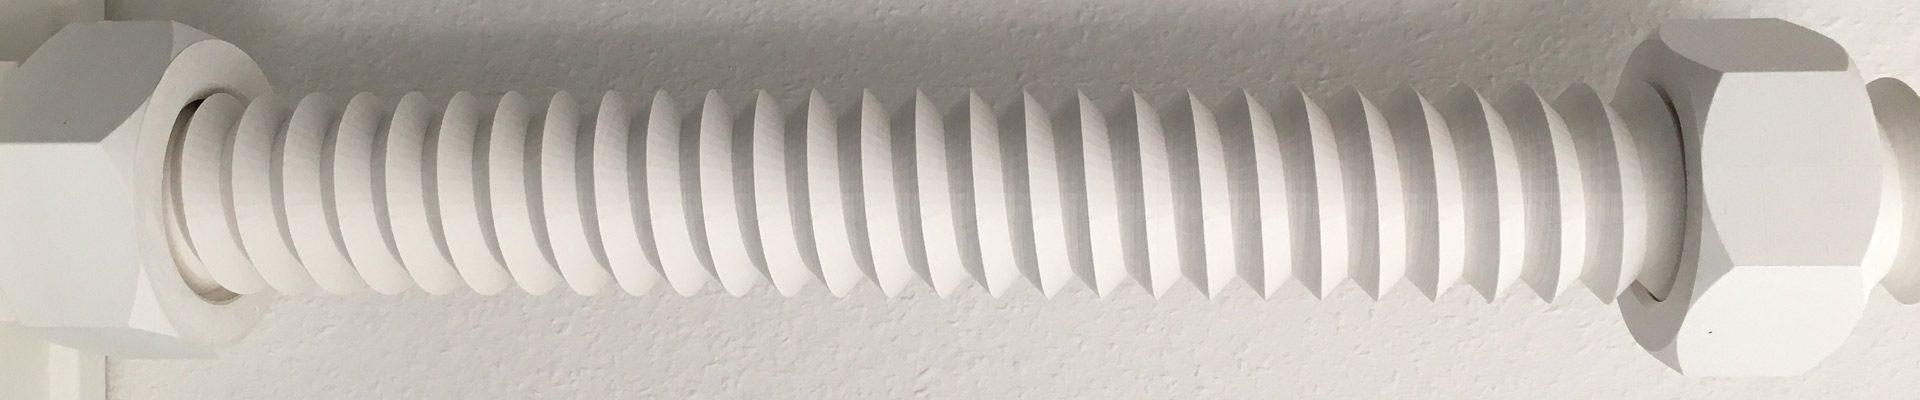 Rheinturm aus dem 3D-Drucker